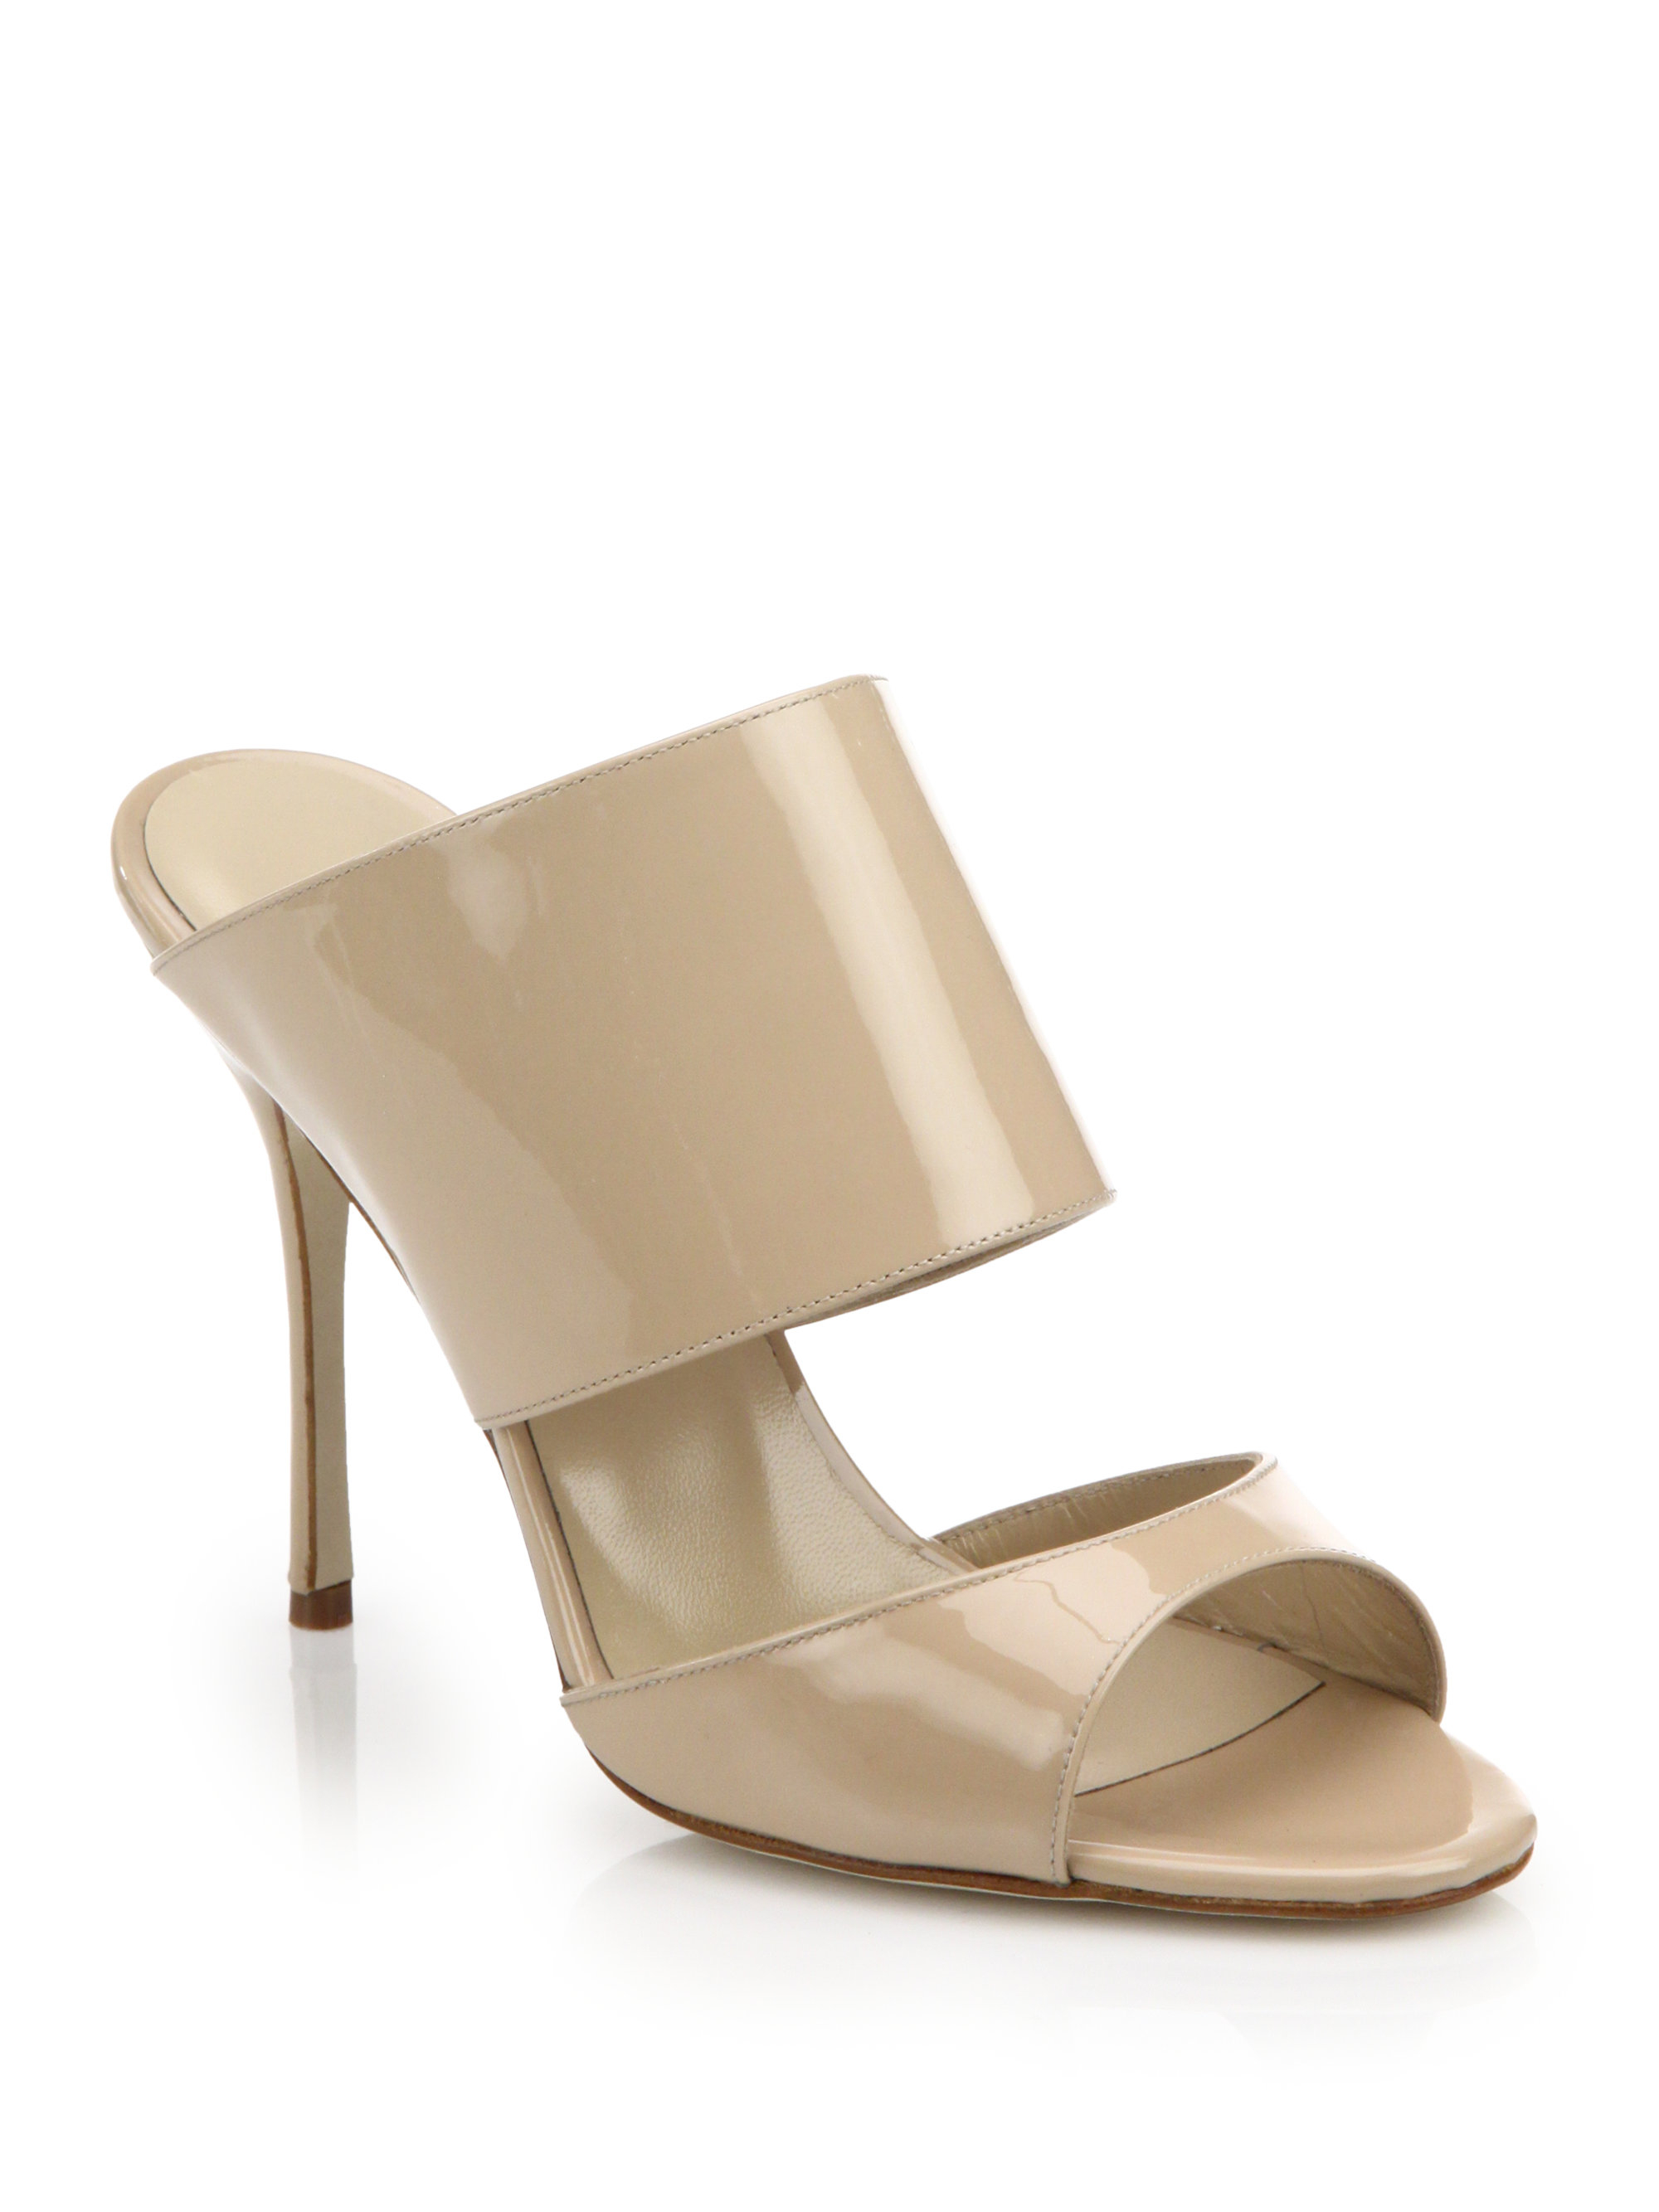 Manolo Blahnik Patent Leather Peep-Toe Mules cost for sale cheap discount sale cheap sale prices cheap sale 100% authentic 4NoX1NtjW